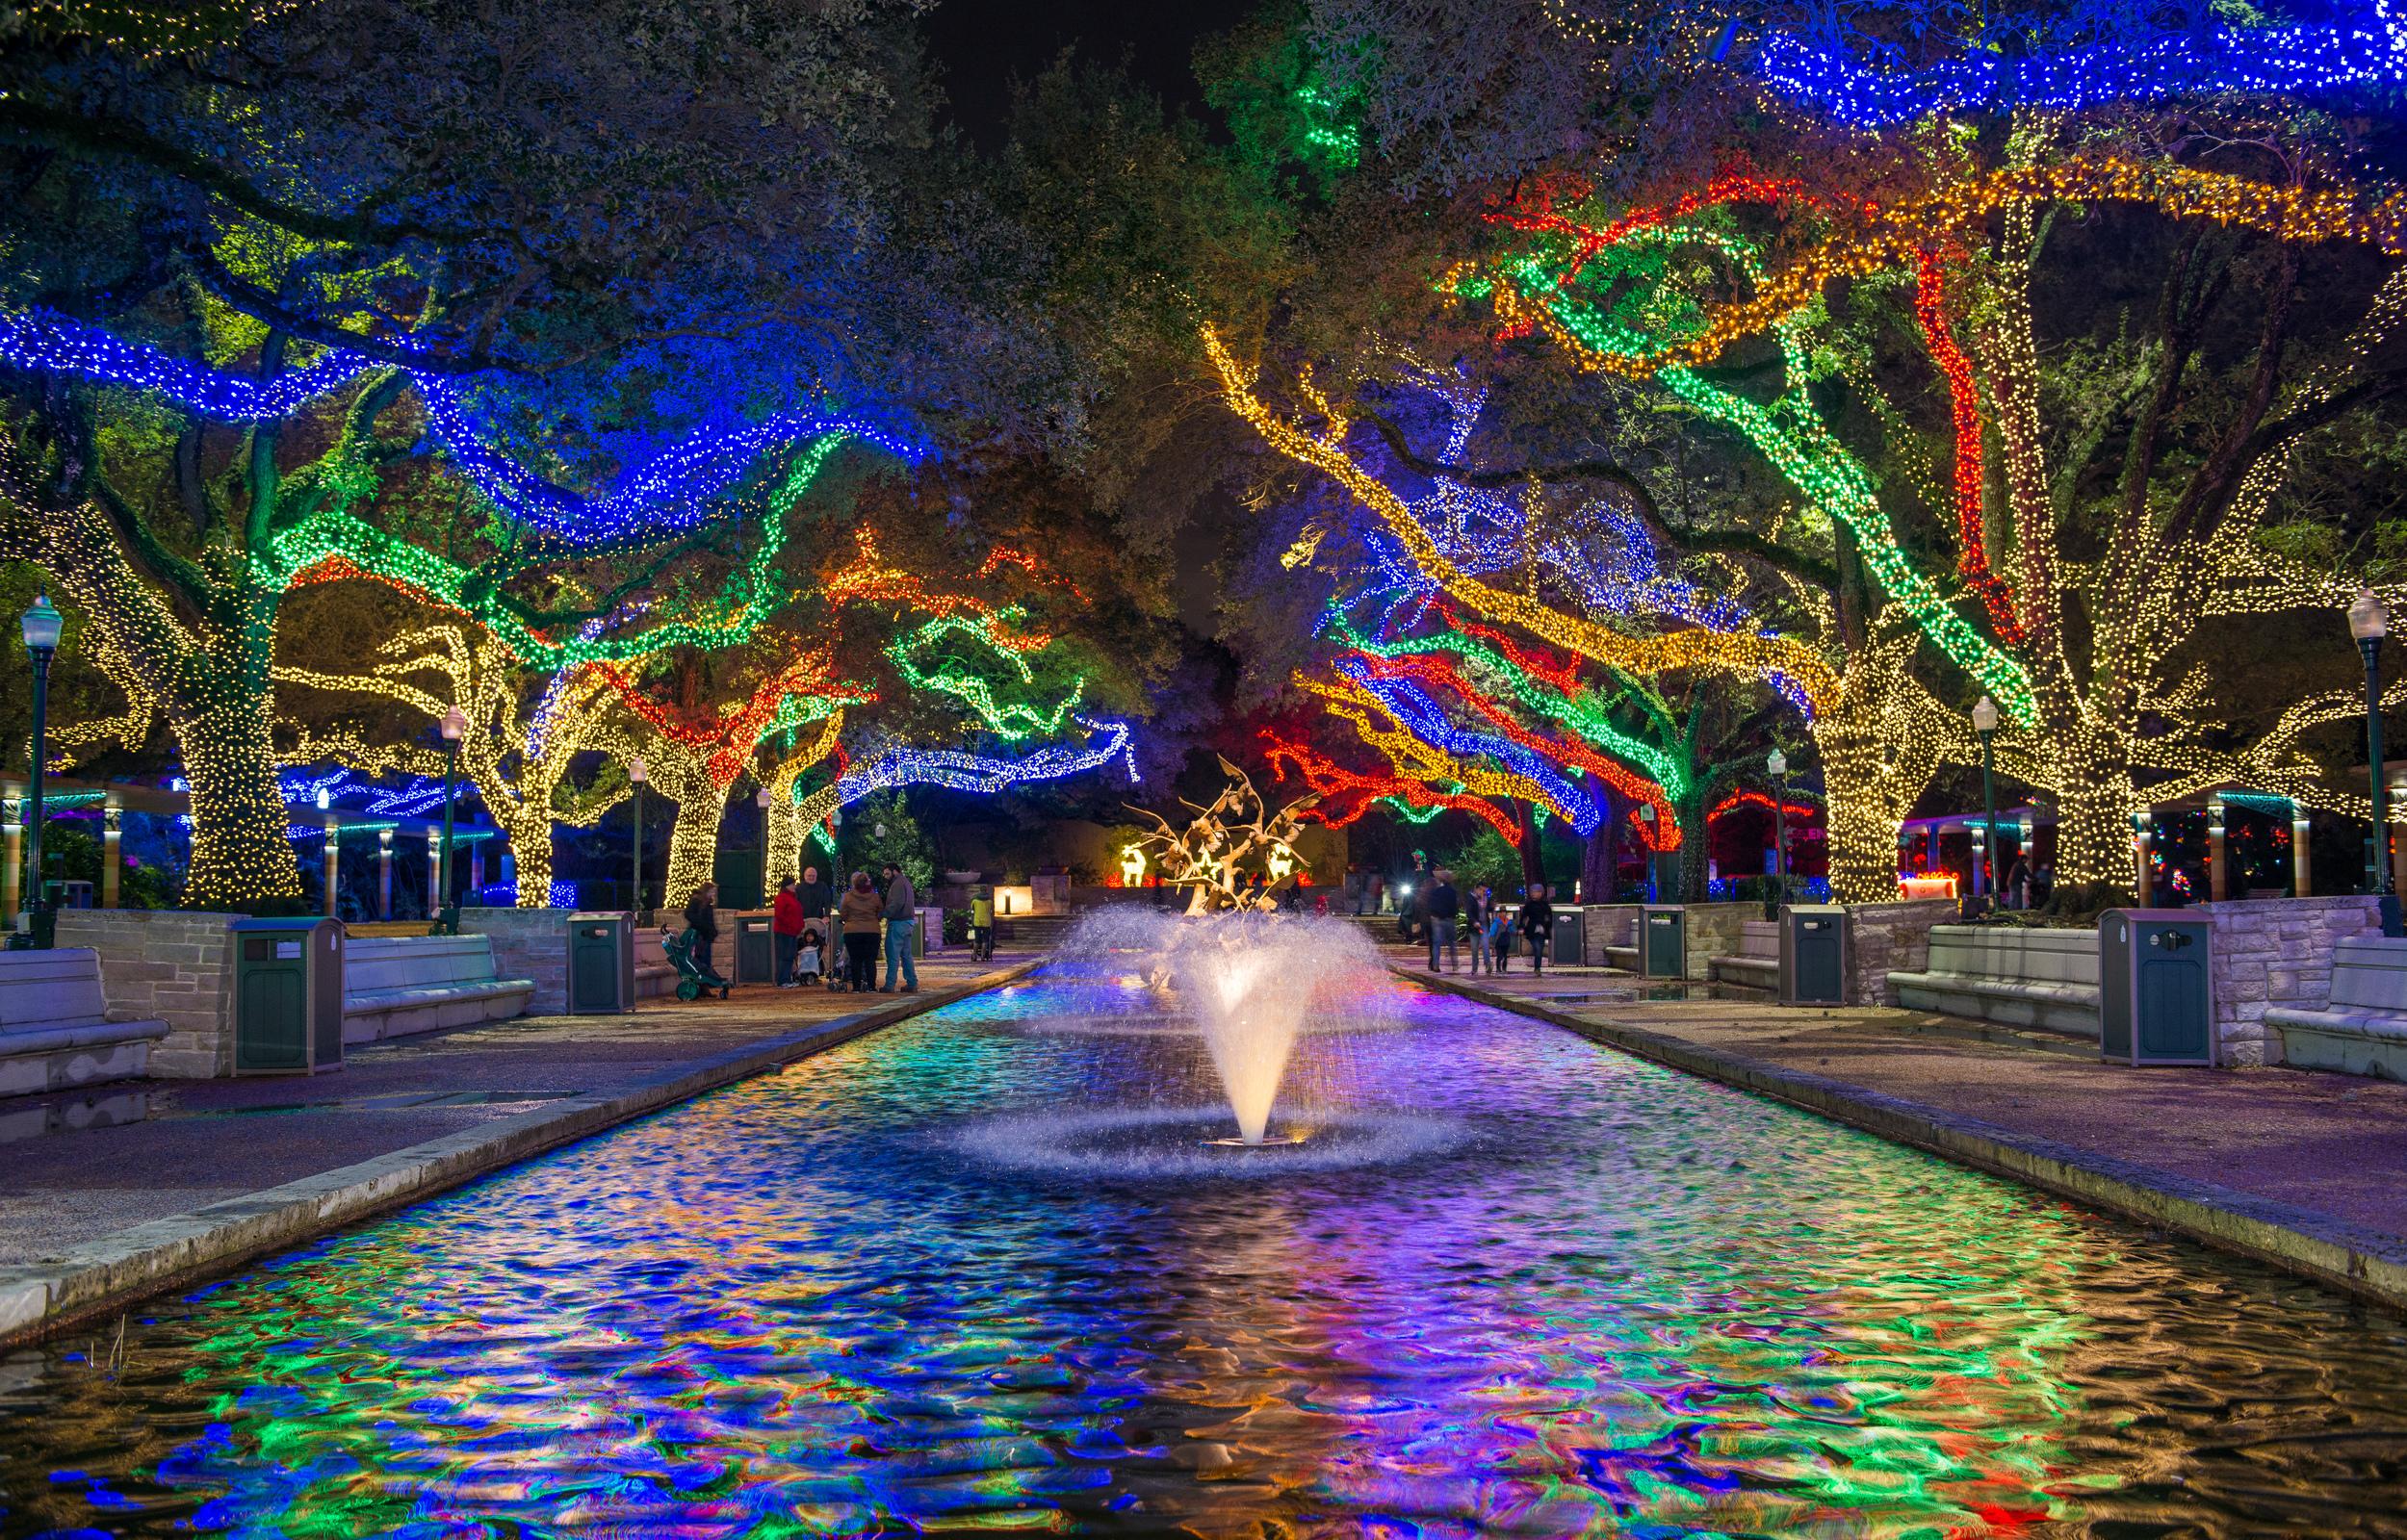 Christmas Lights Houston 2020 It's Beginning to Look A Lot Like Zoo Lights   The Houston Zoo